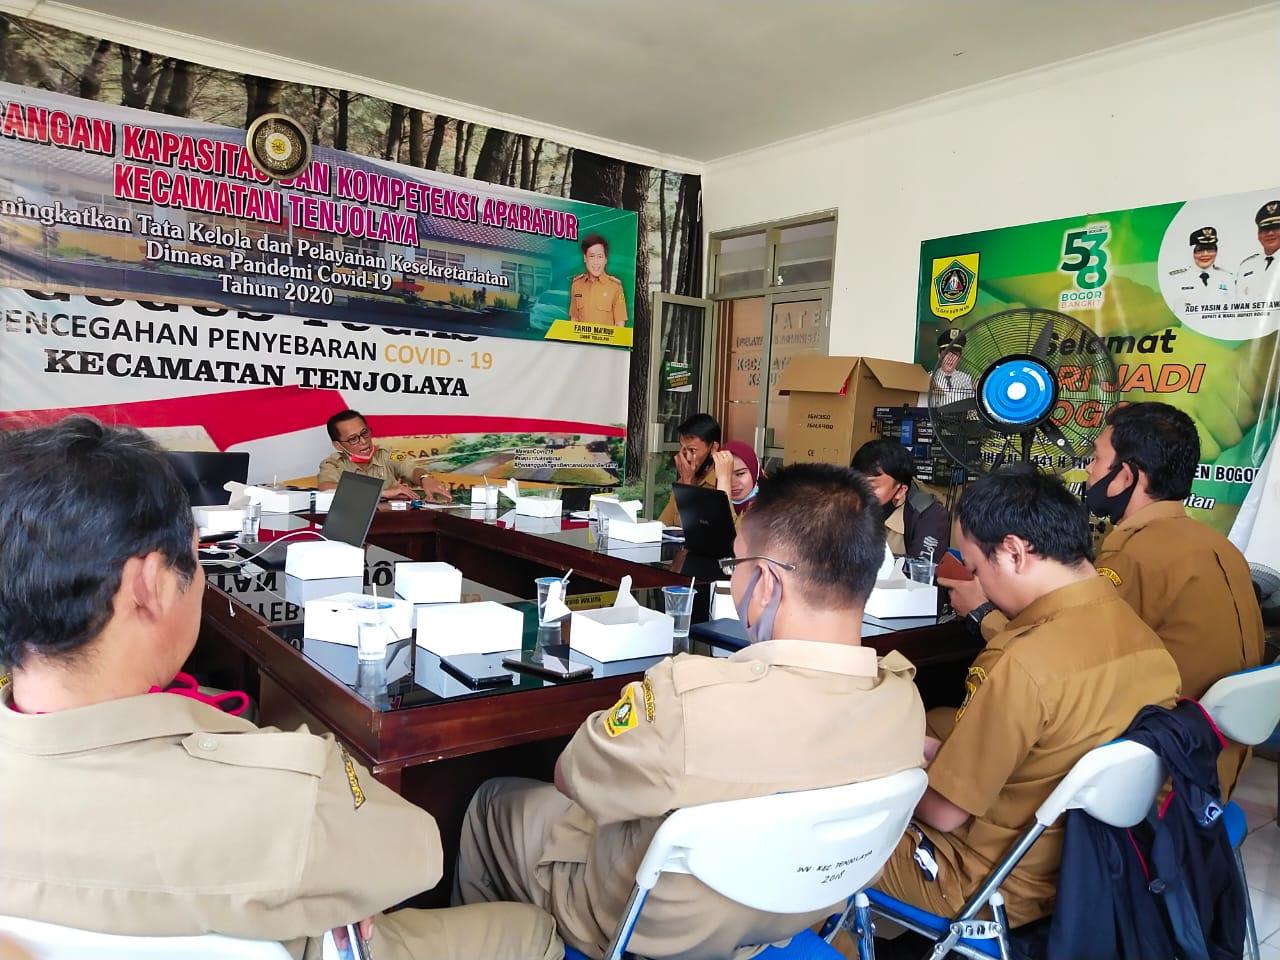 Kegiatan Sosialisasi Perbup No. 64 dan 65 Tahun 2020 Mengenai Penyaluran ADD dan BHPRD Bersama Para Sekdes dan Kaur Keuangan Se-Kecamatan Tenjolaya.